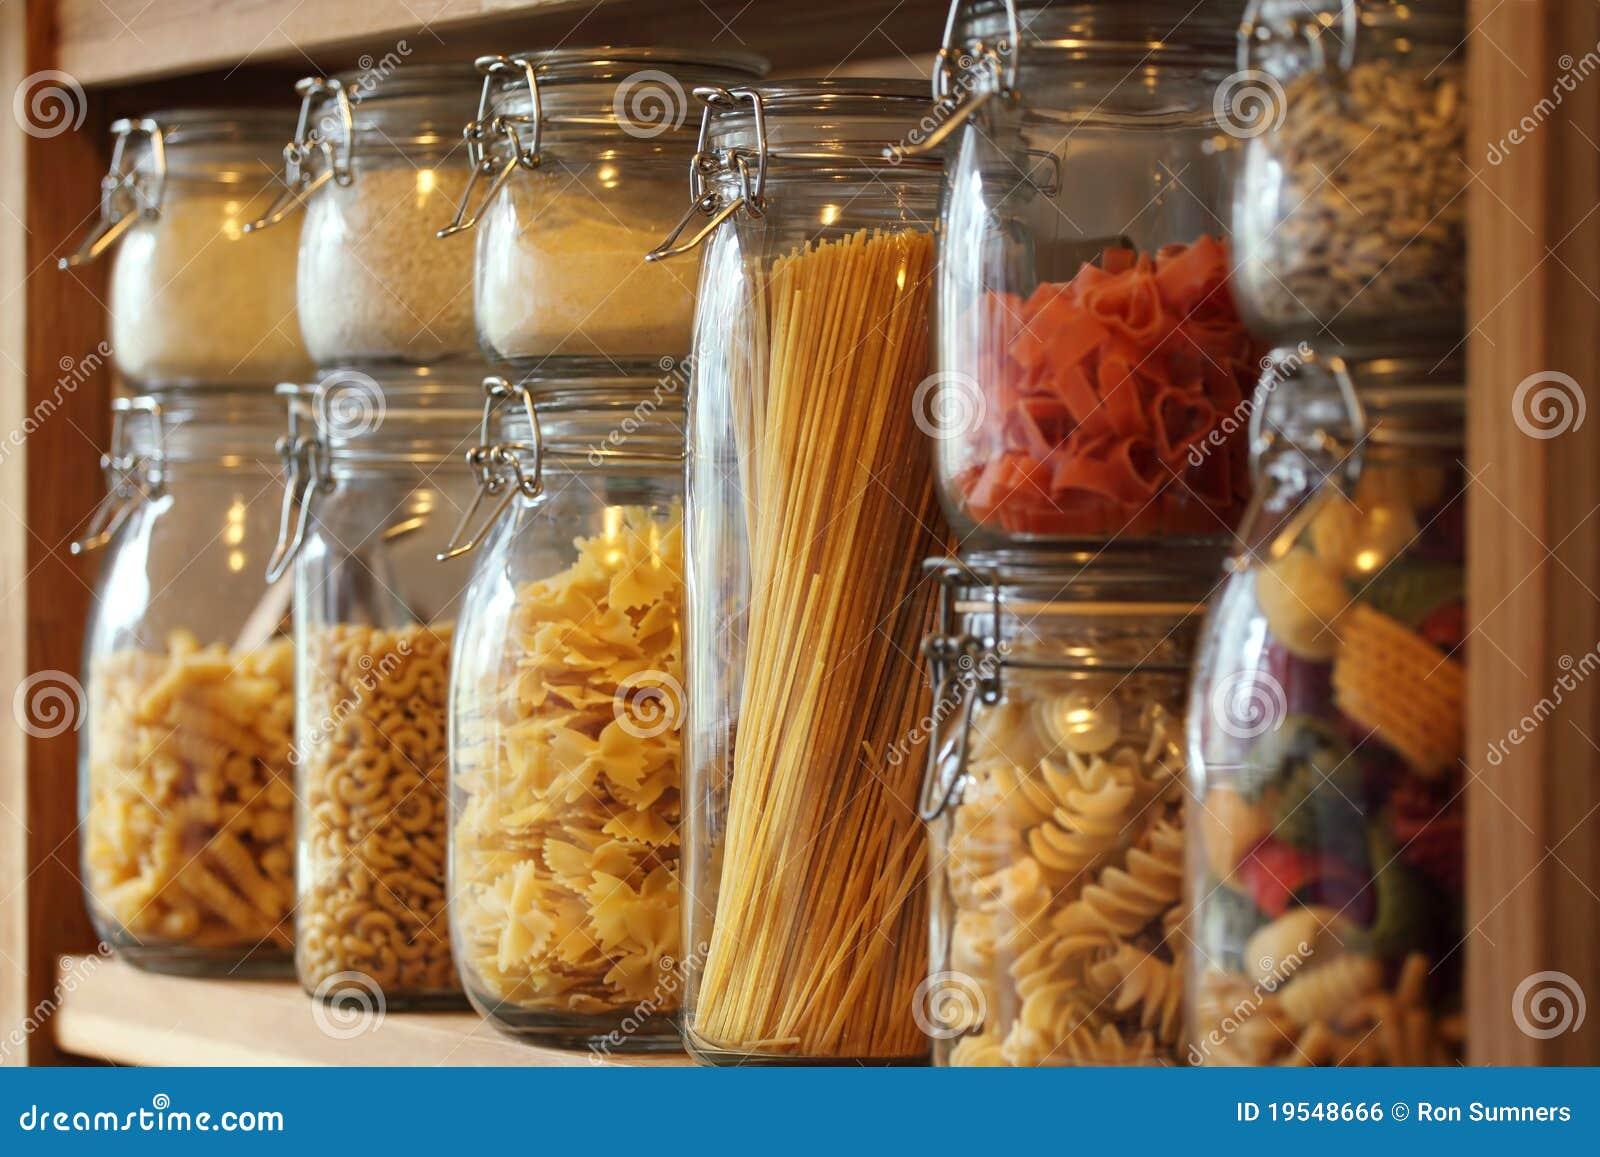 Dried pasta in jars on a shelf